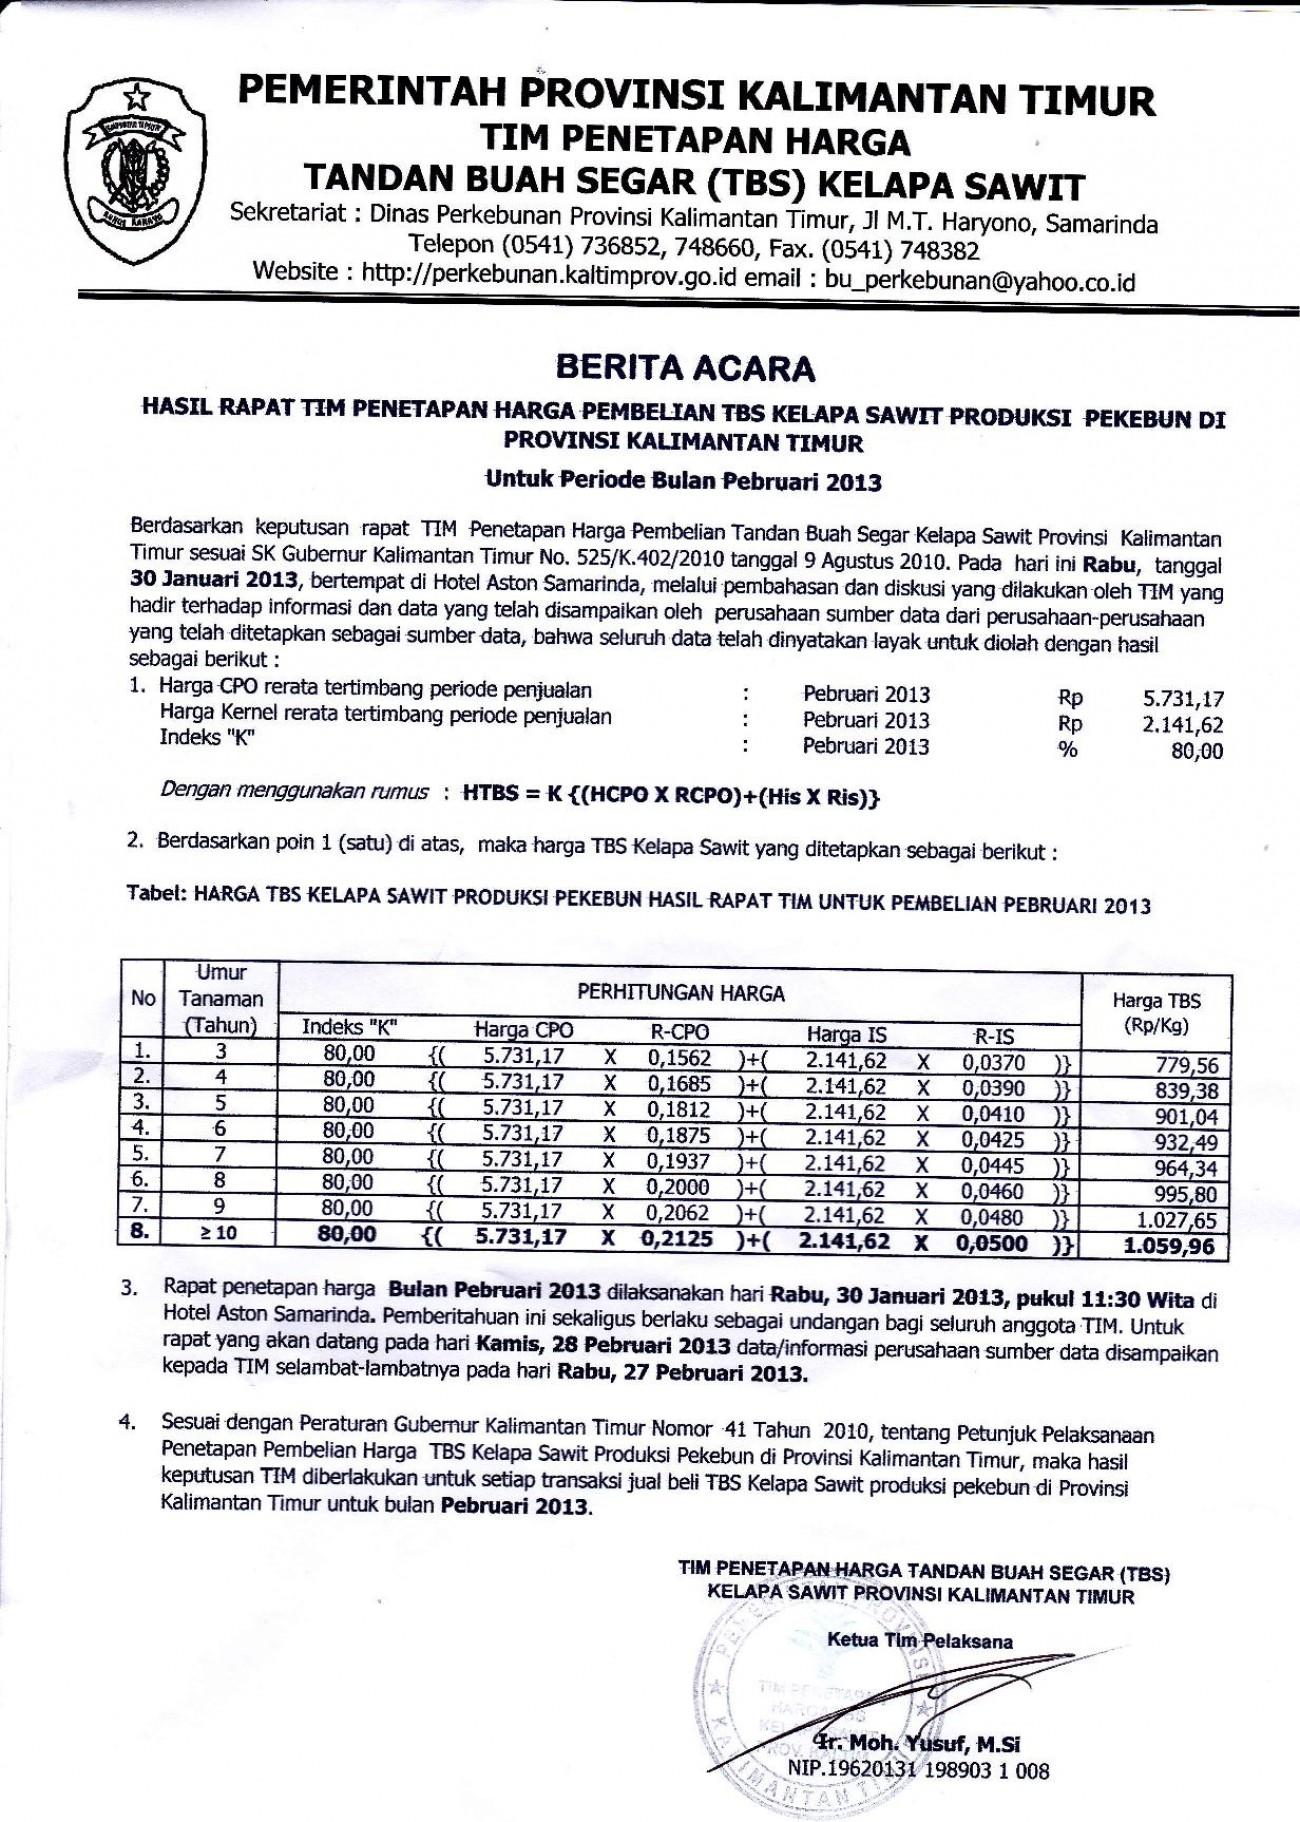 Informasi Harga TBS Kelapa Sawit Bulan Pebruari 2013